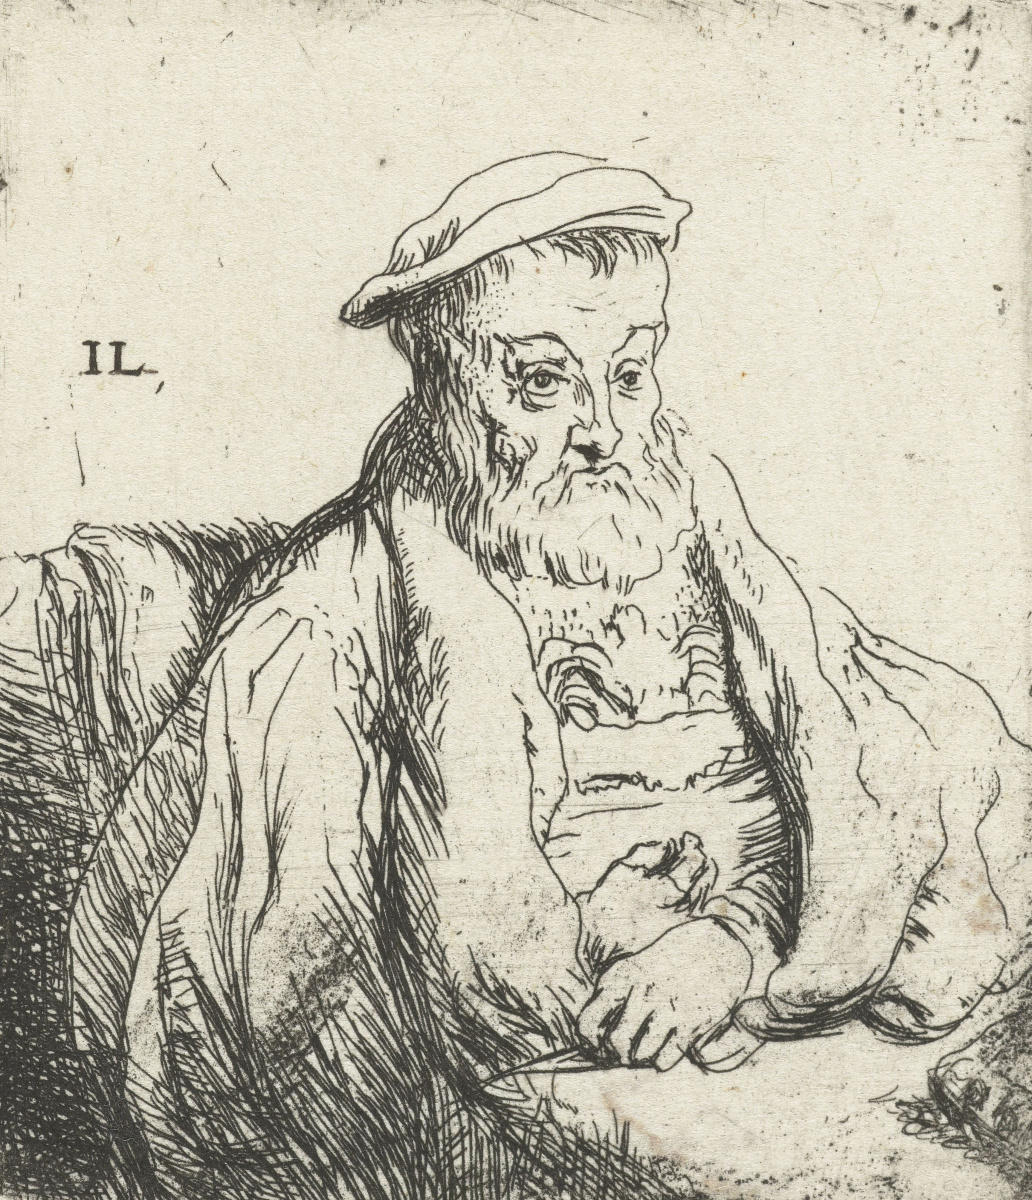 Ян Ливенс. Сидящий пожилой господин в берете